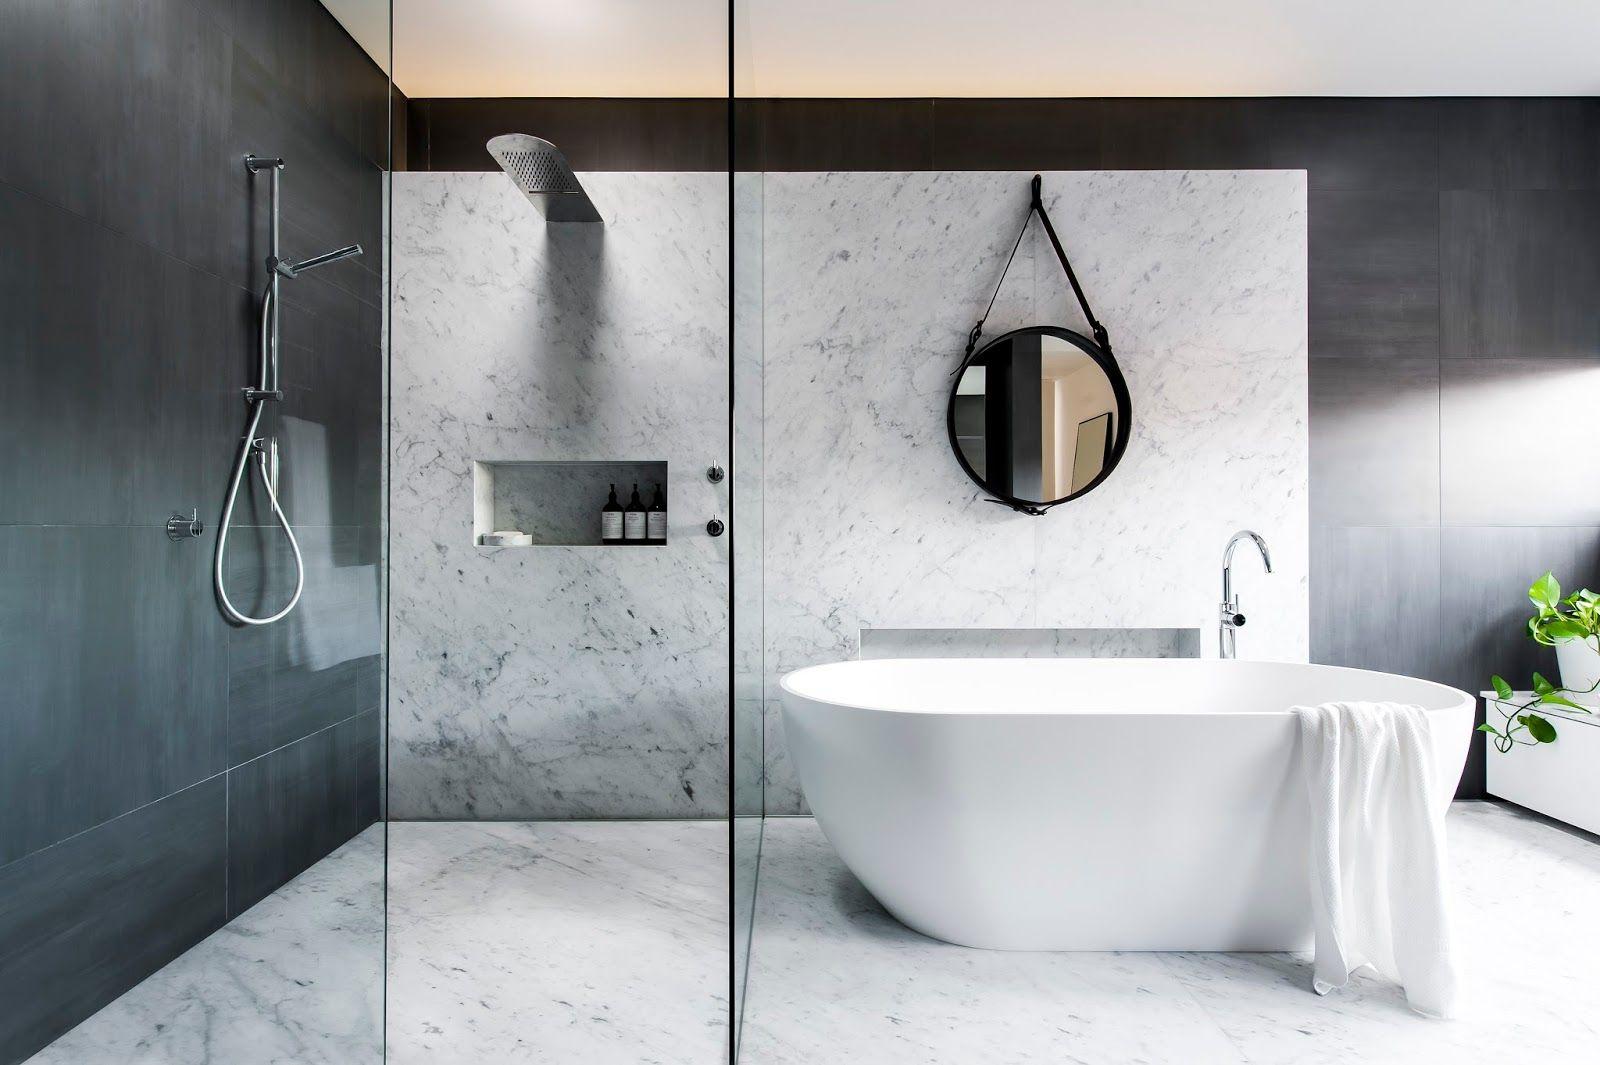 Minosa Design: Understated elegance creates a stunning bathroom ...